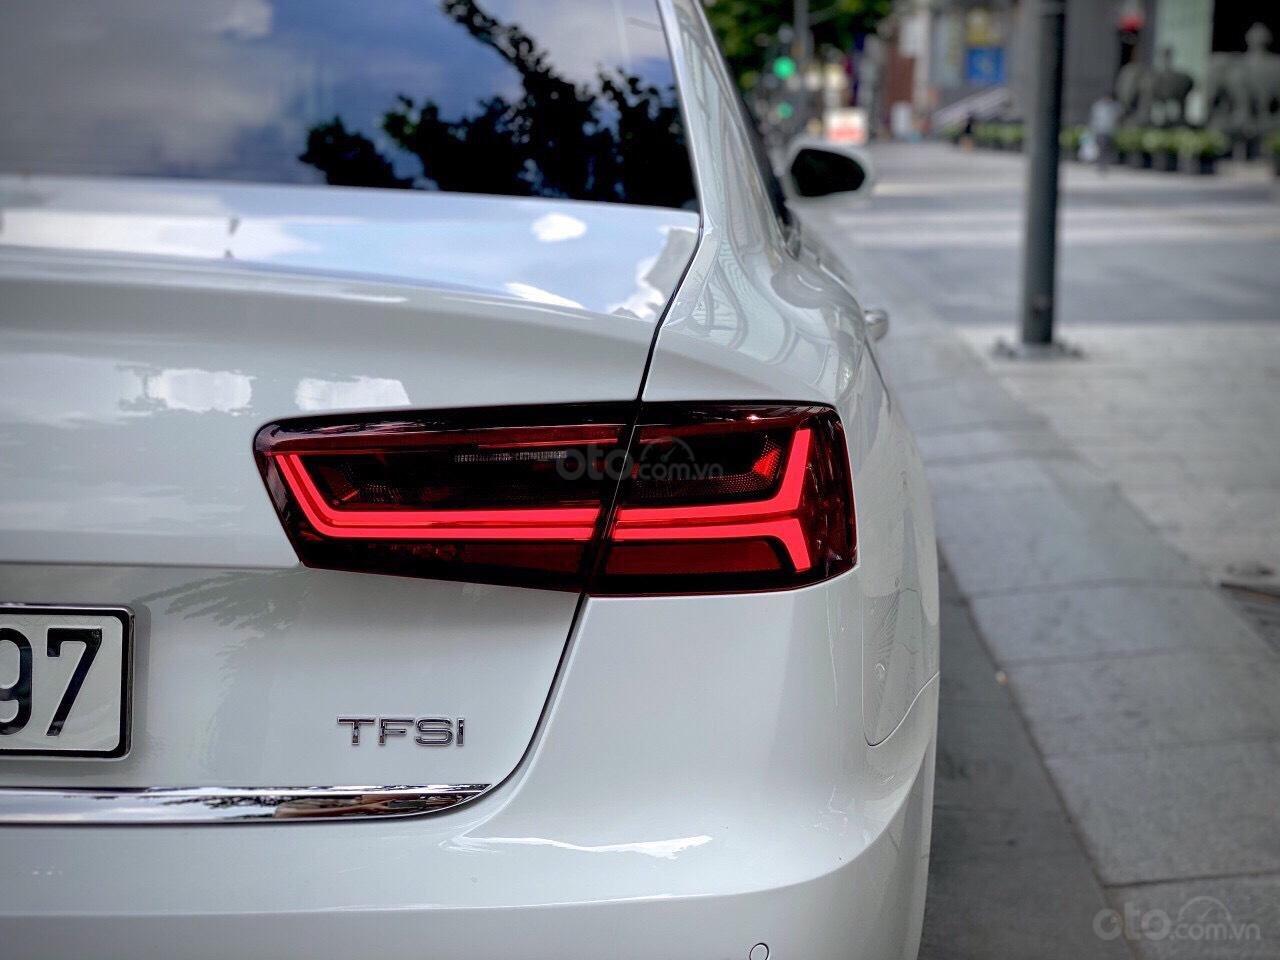 Audi A6 1.8 TFSI 2016 - giá bán 1 tỷ 530 triệu (8)